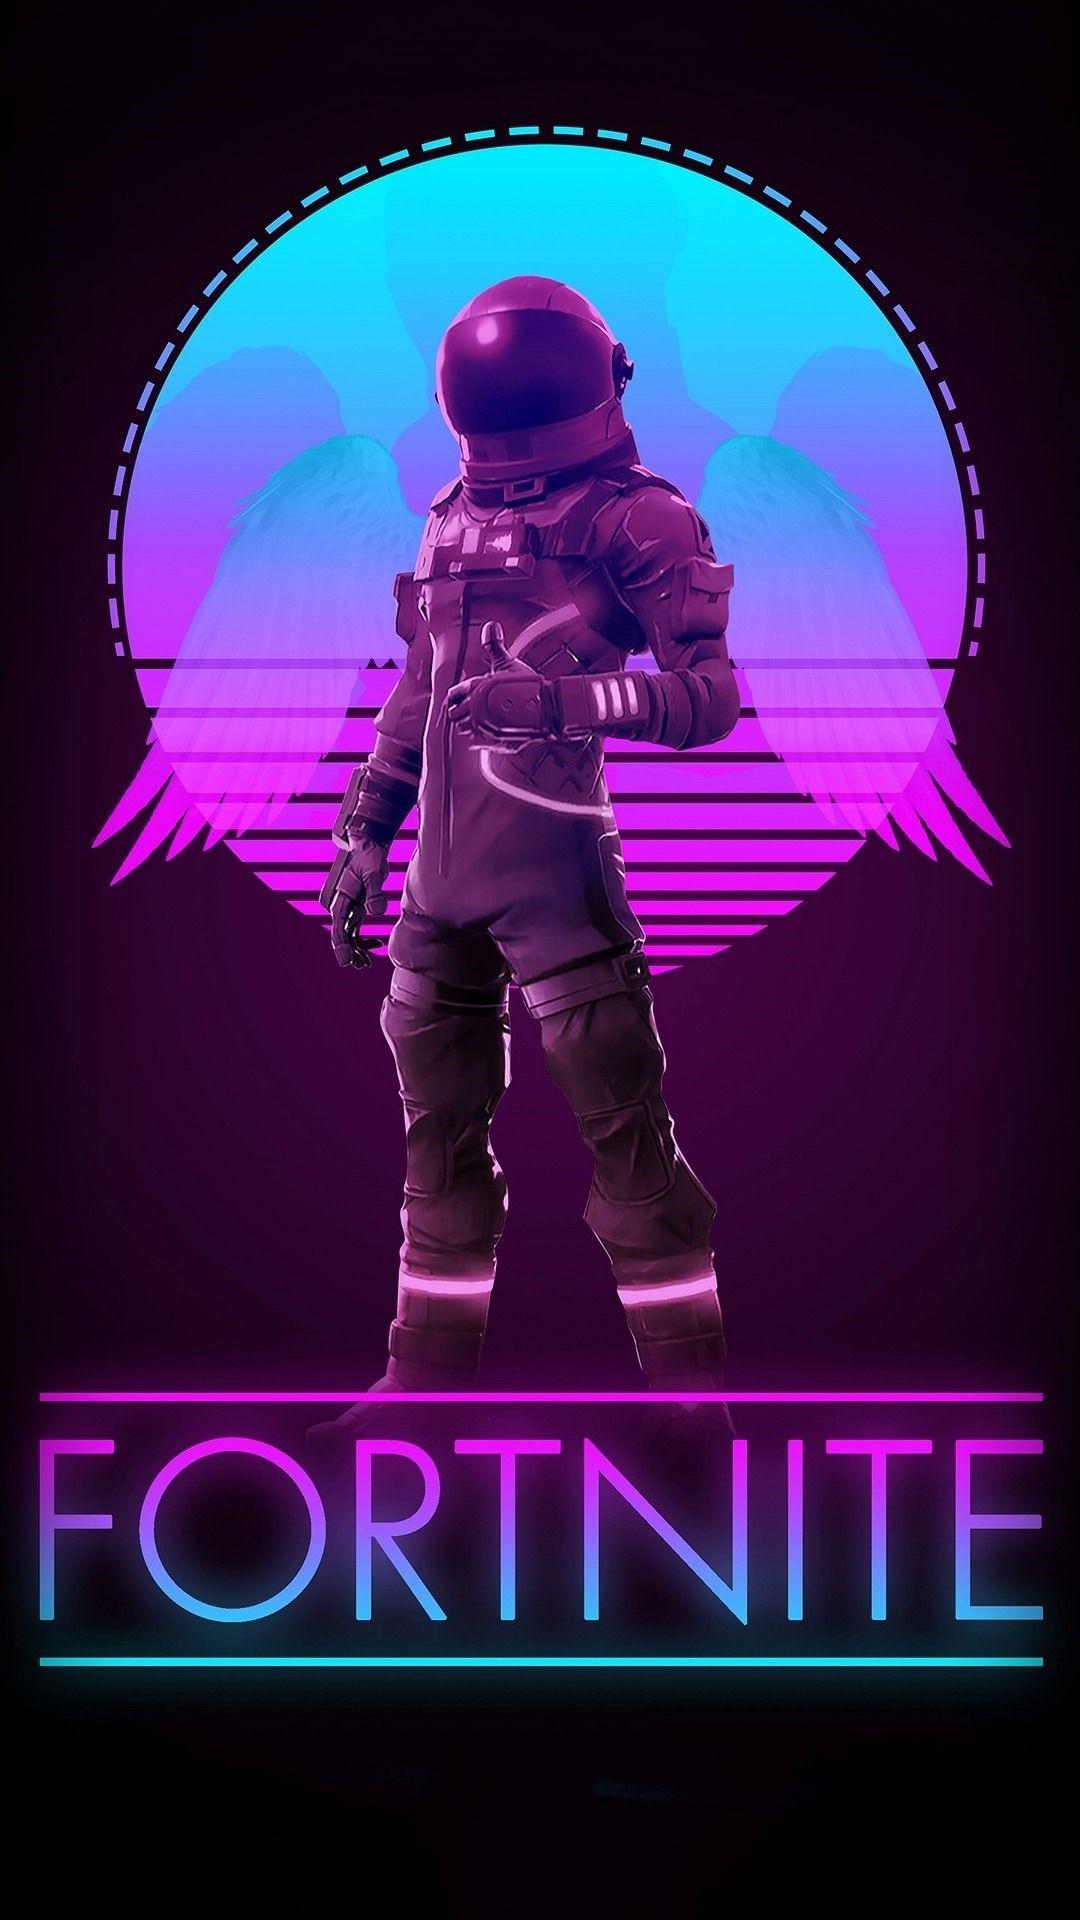 Fortnite wallpaper for android